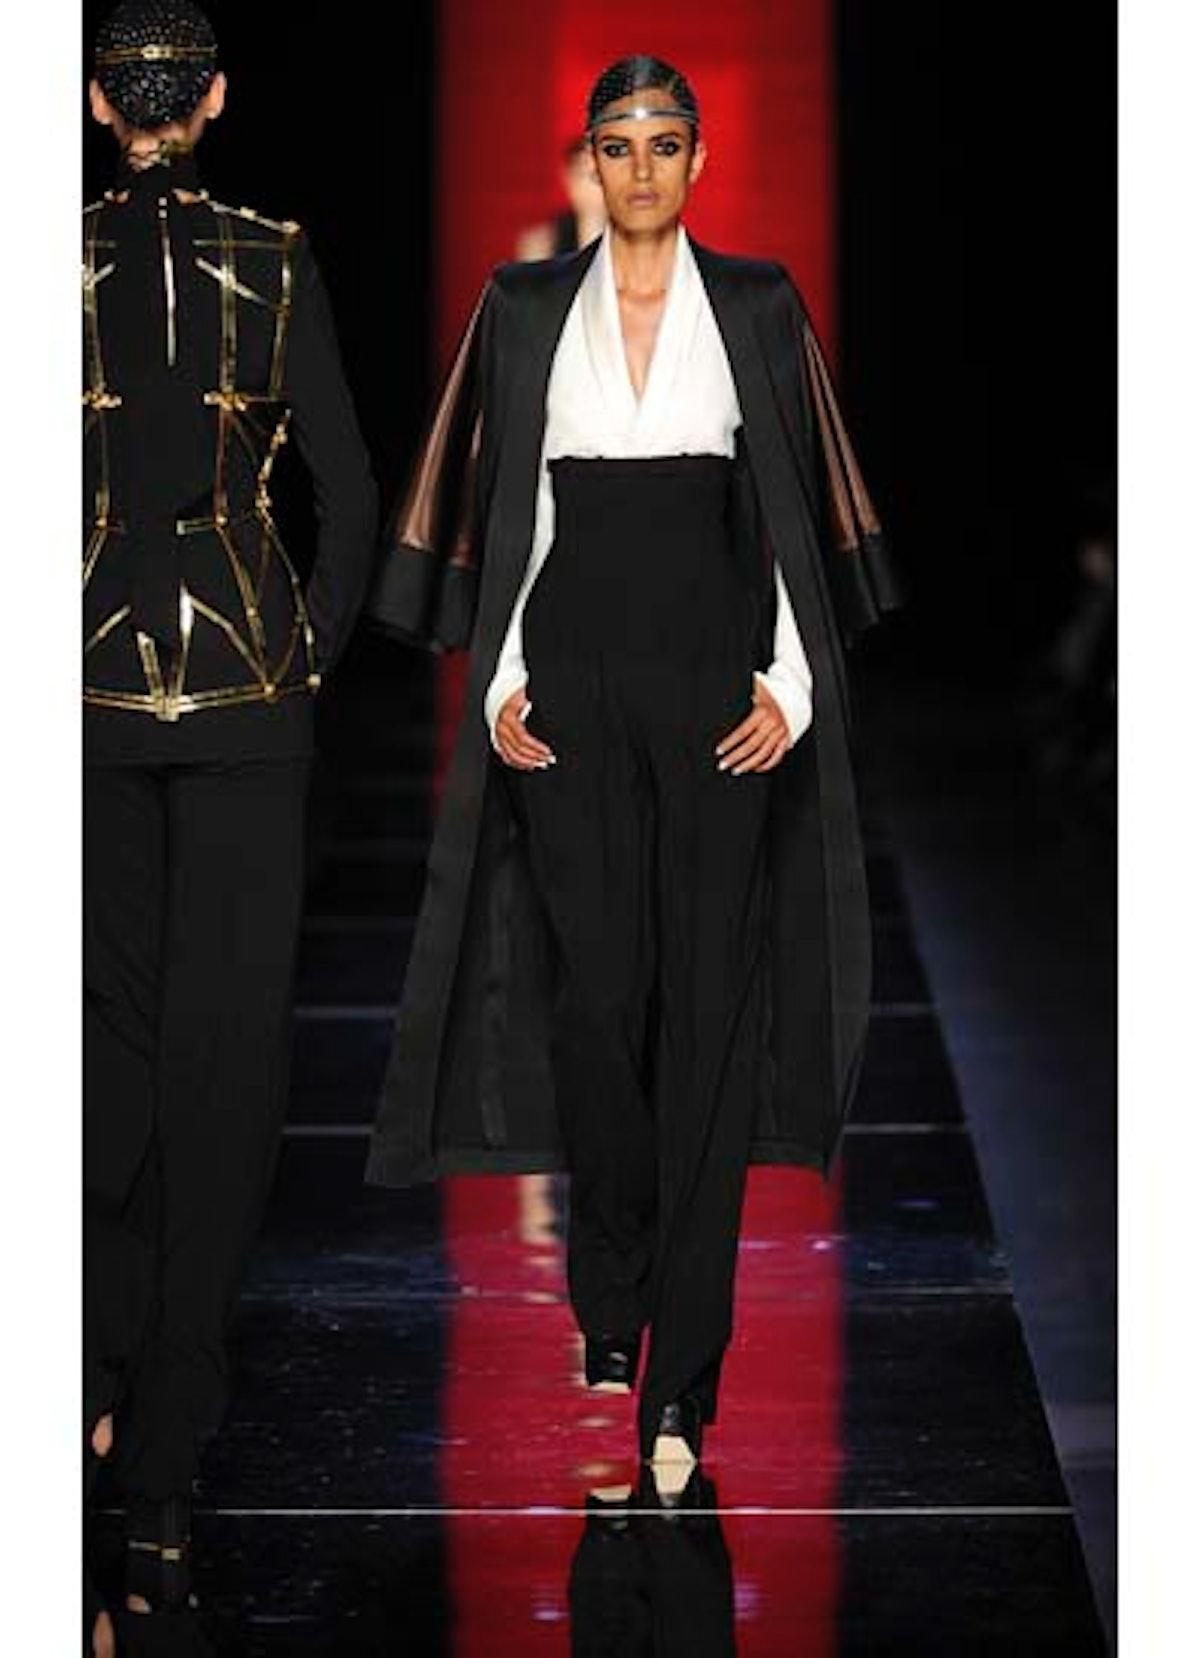 fass-jean-paul-gaultier-couture-2012-runway-17-v.jpg